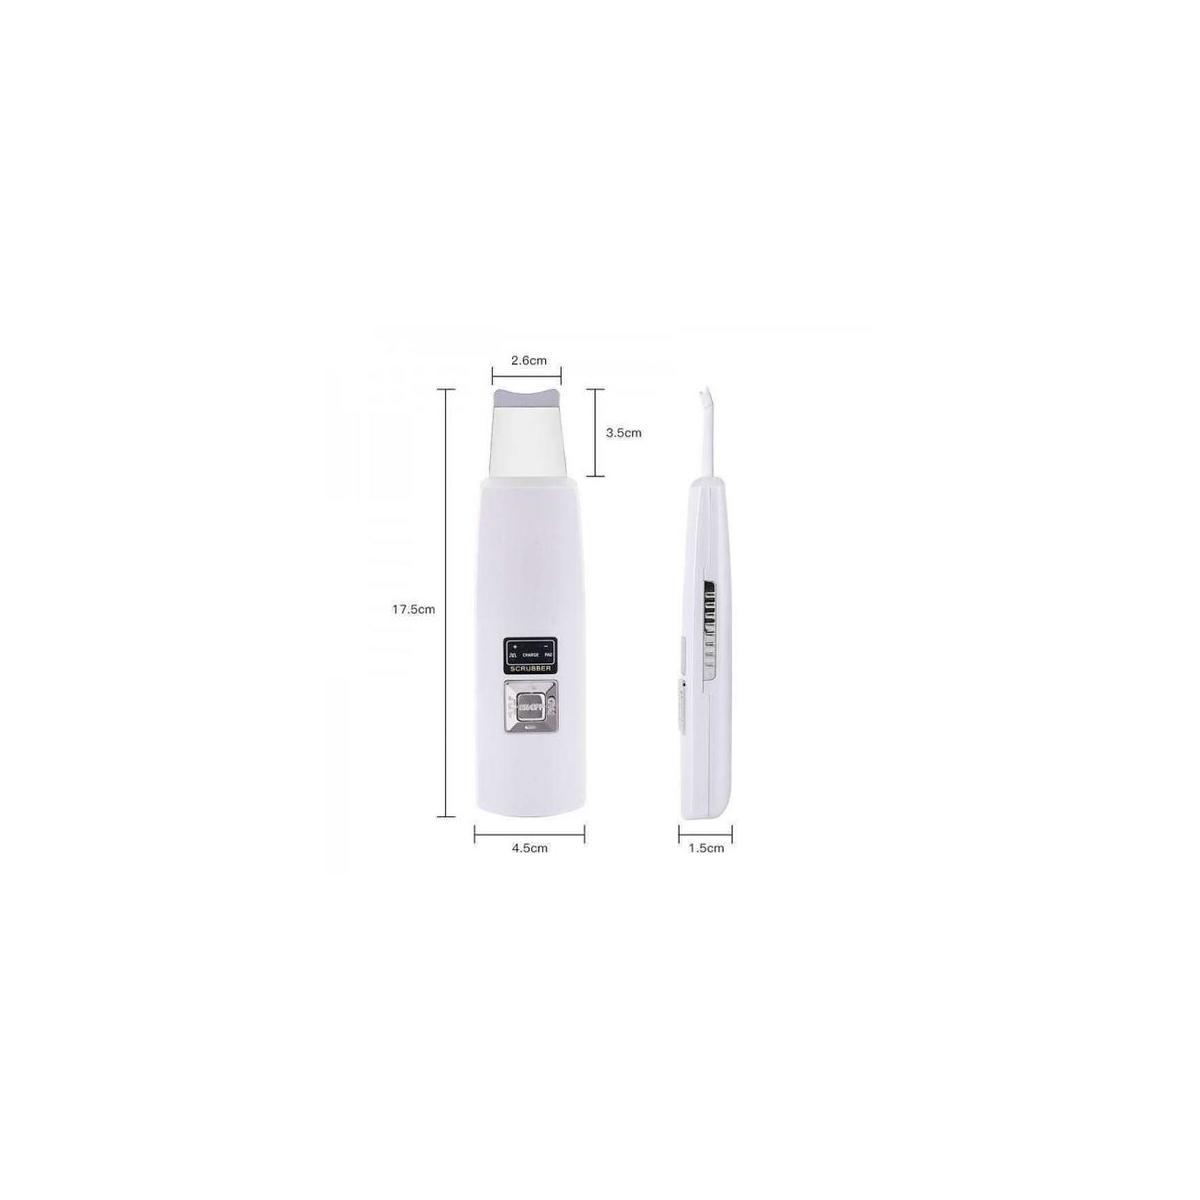 Ultrasonic Ionic Skin Scrubber for Acne Treatment (Free Shipping Worldwide)